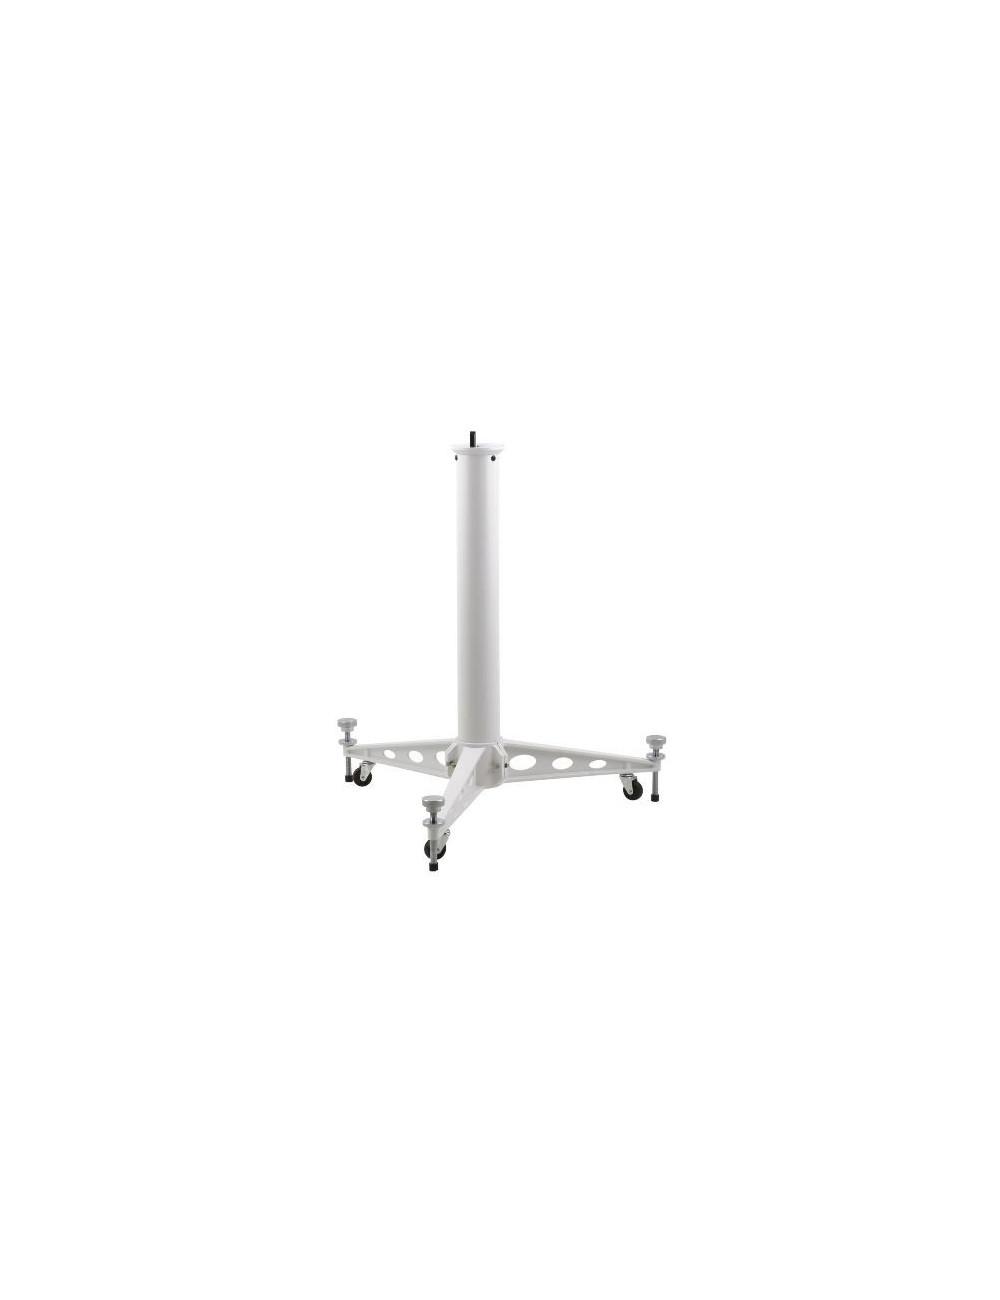 Pied colonne Sky-Watcher pour EQ6 / EQ6-R / AZ-EQ6